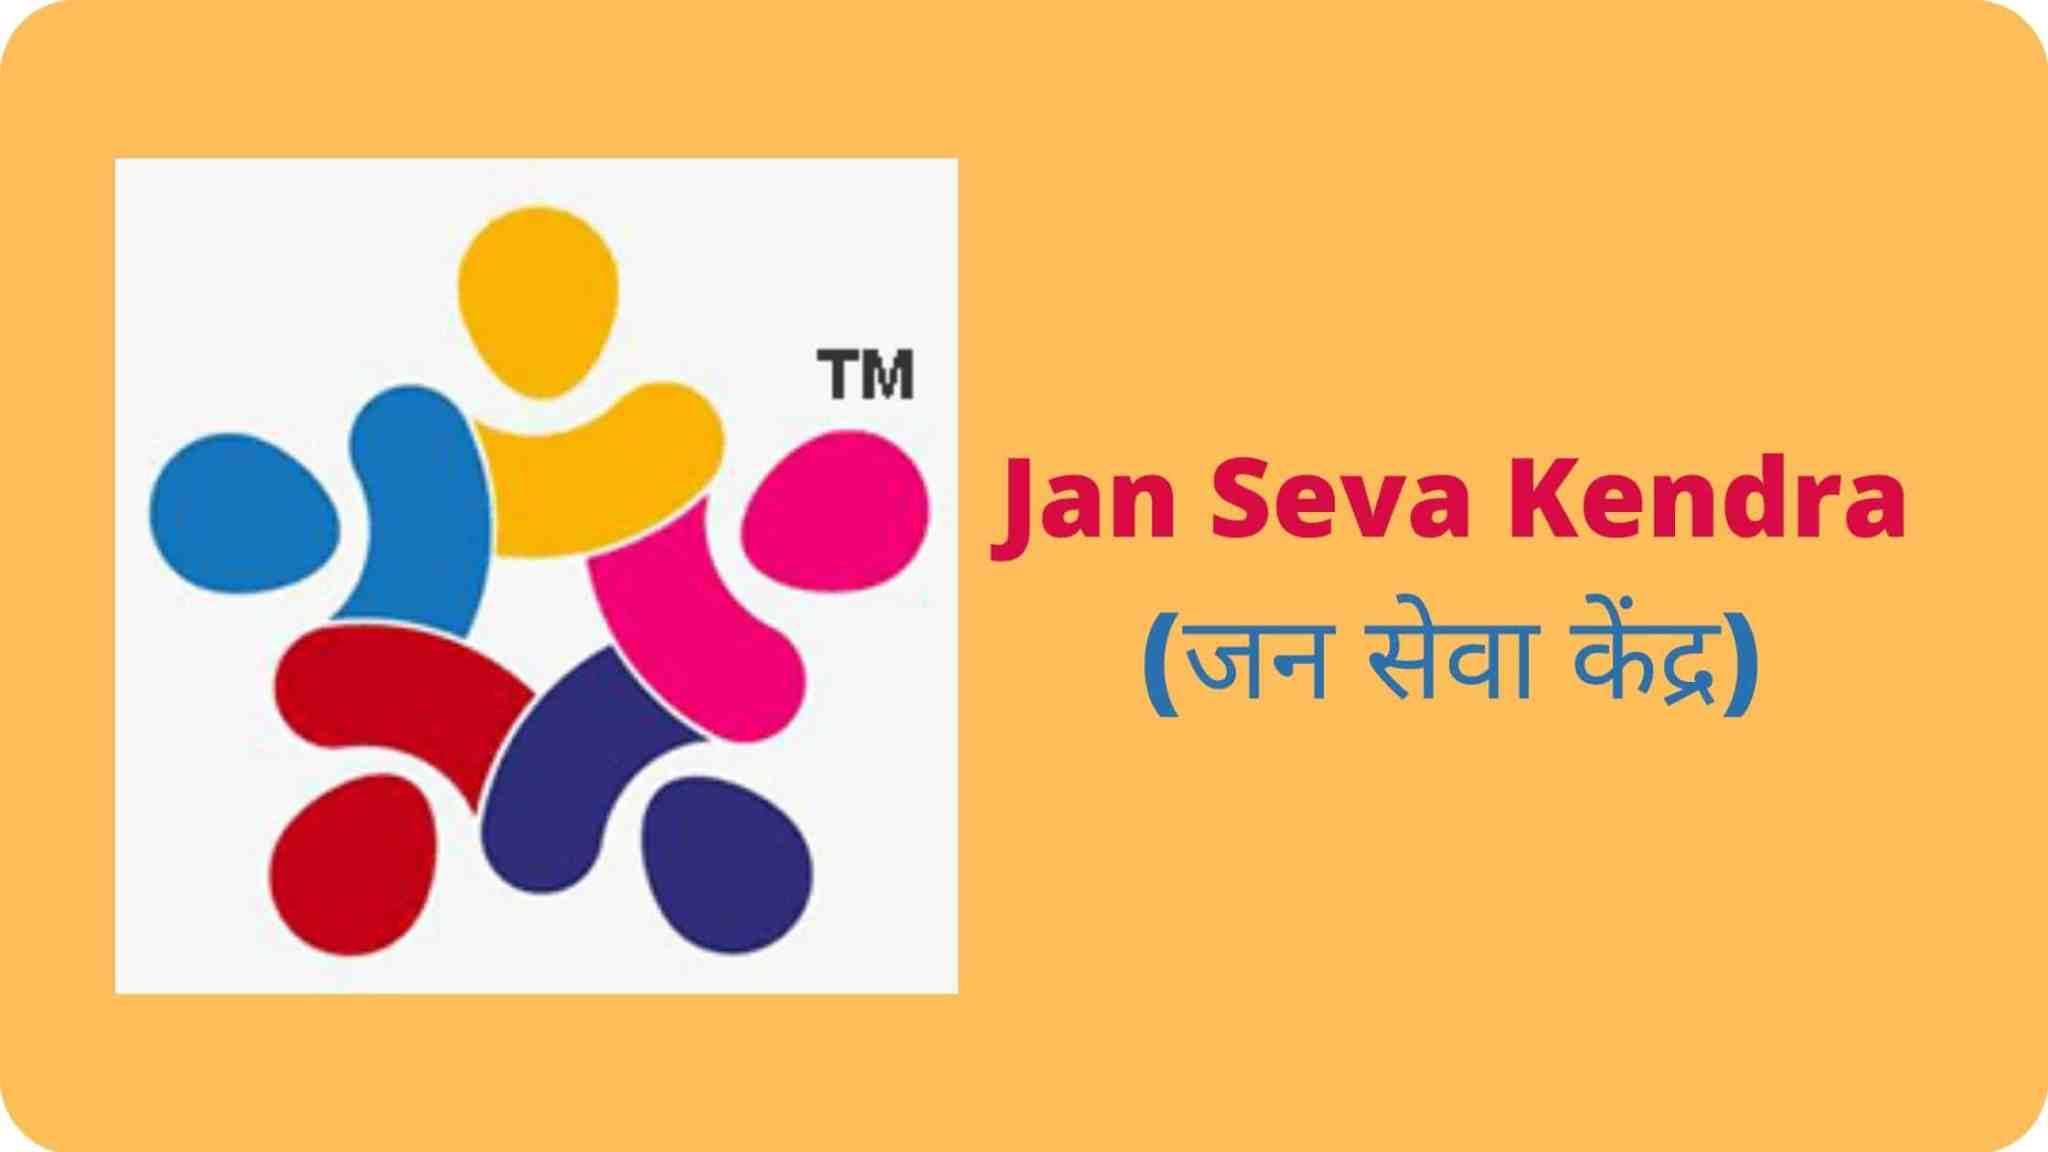 jan-seva-kendra-in-hindi-जन-सेवा-केंद्र